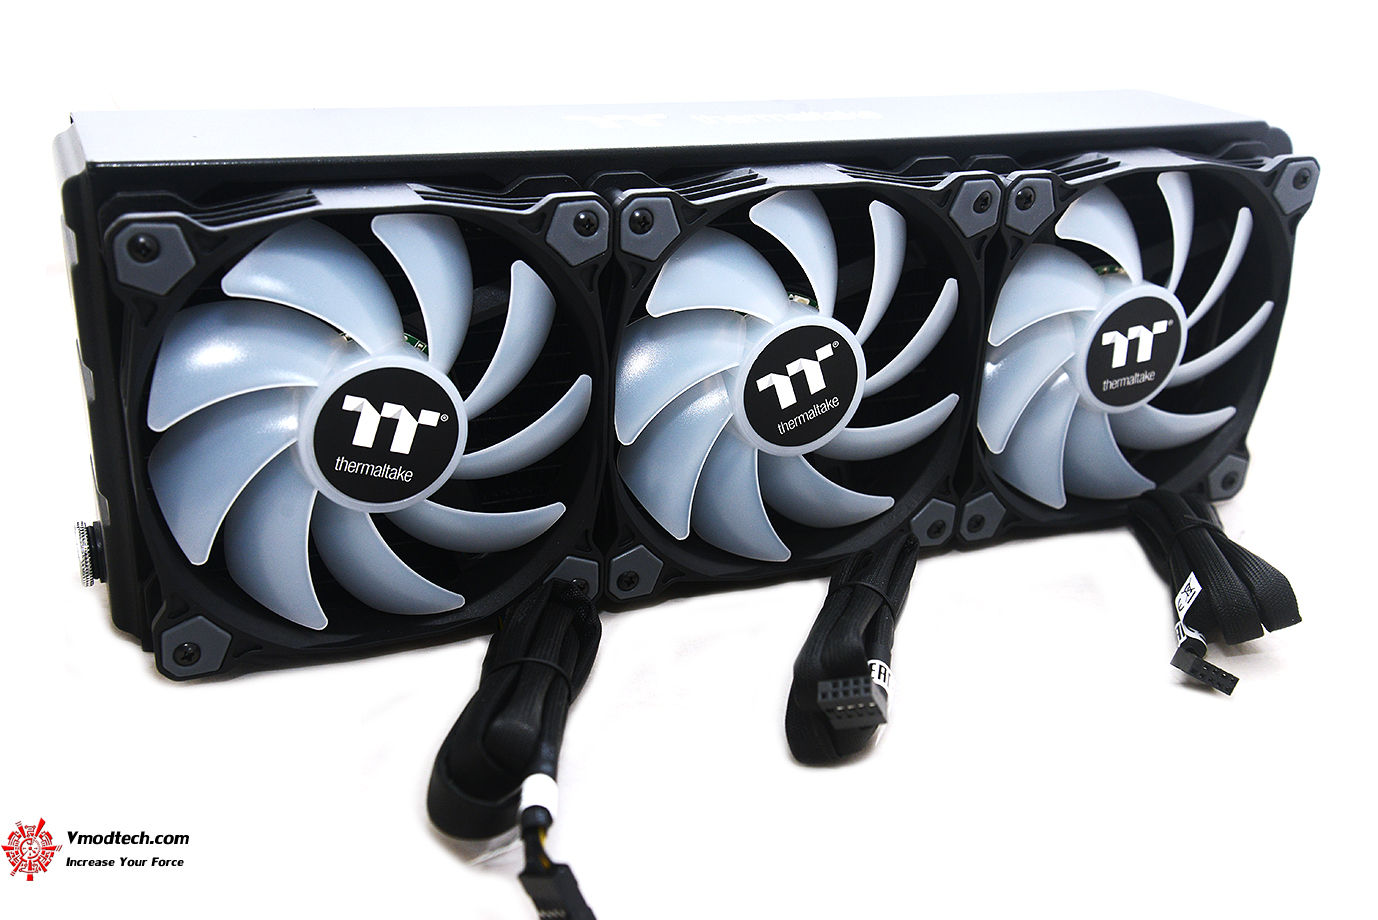 dsc 8879 Thermaltake Pure Plus 12 LED RGB Radiator Fan TT Premium Edition (3 Fan Pack) Review